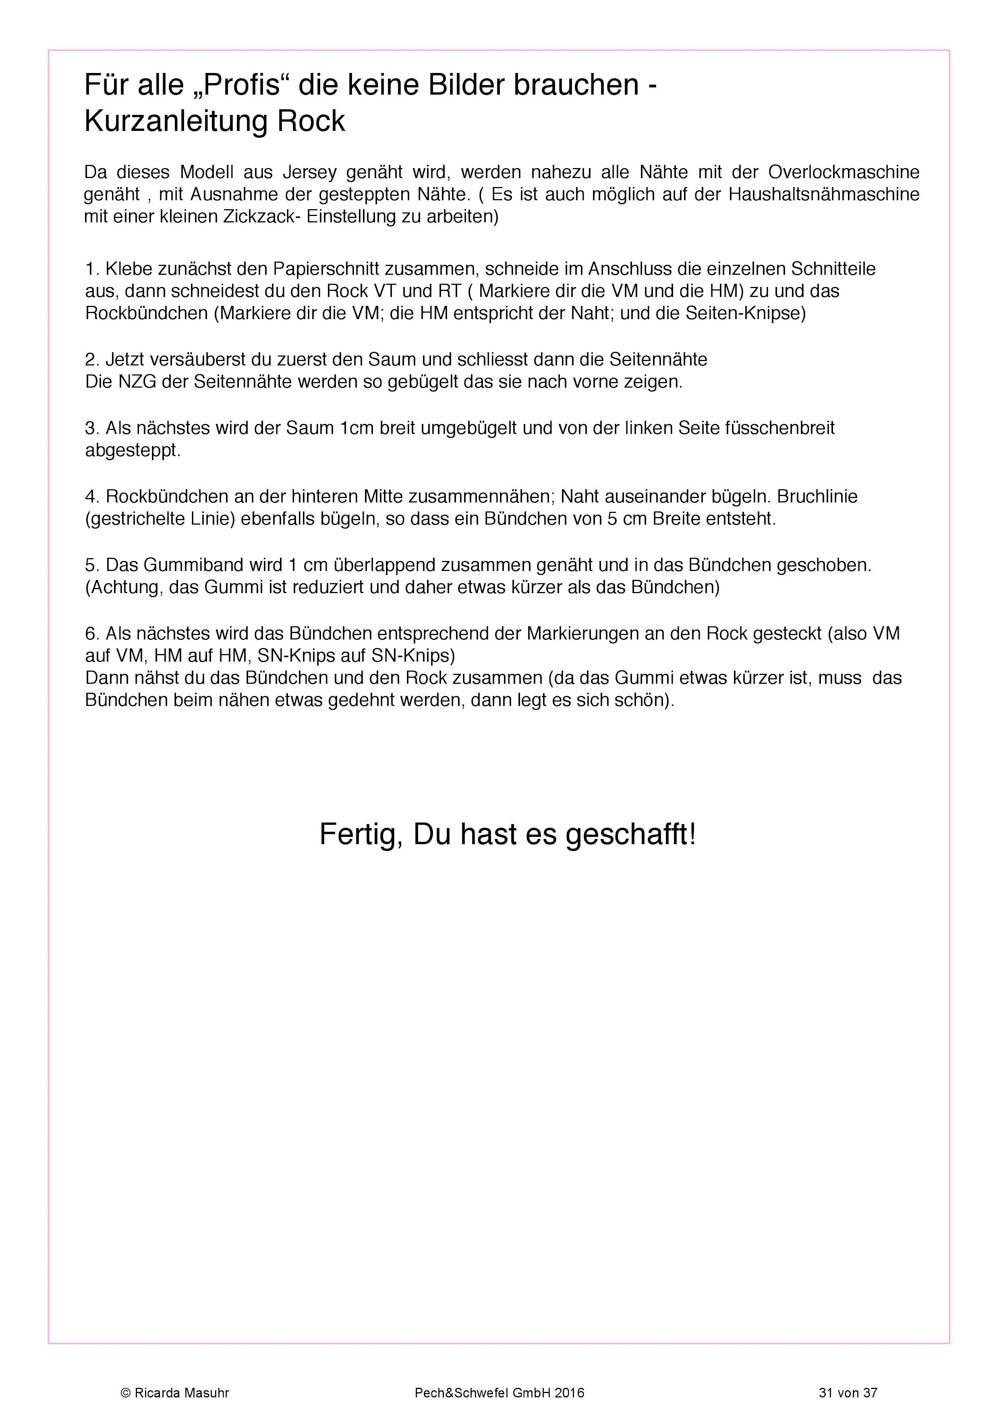 SchnittmusterWinterhudePechUndSchwefel-0031